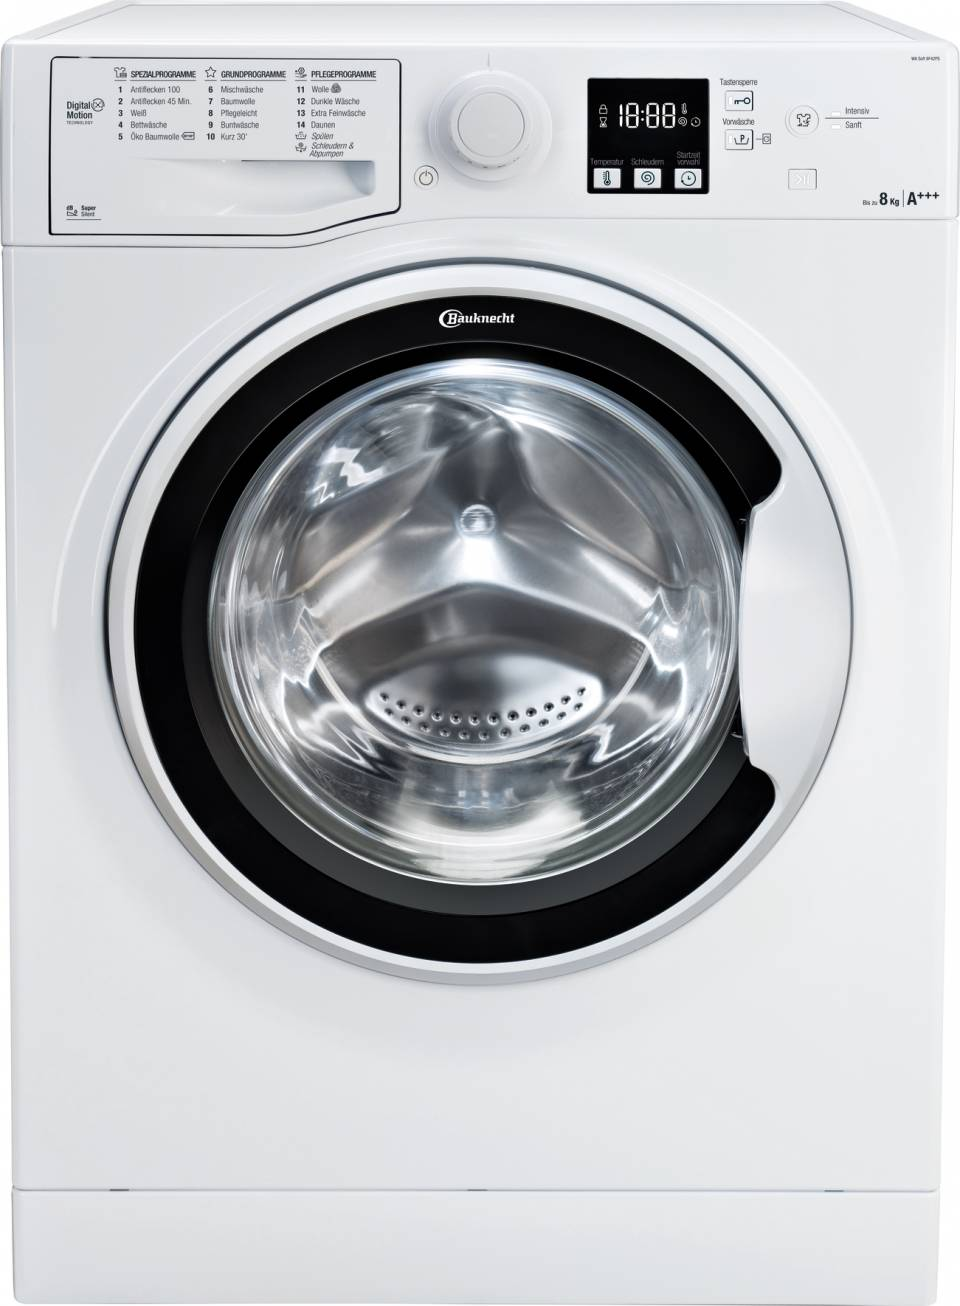 Bauknecht Waschmaschine BK 1000 WA Soft 8F42PS mit Digital Motion Technology.